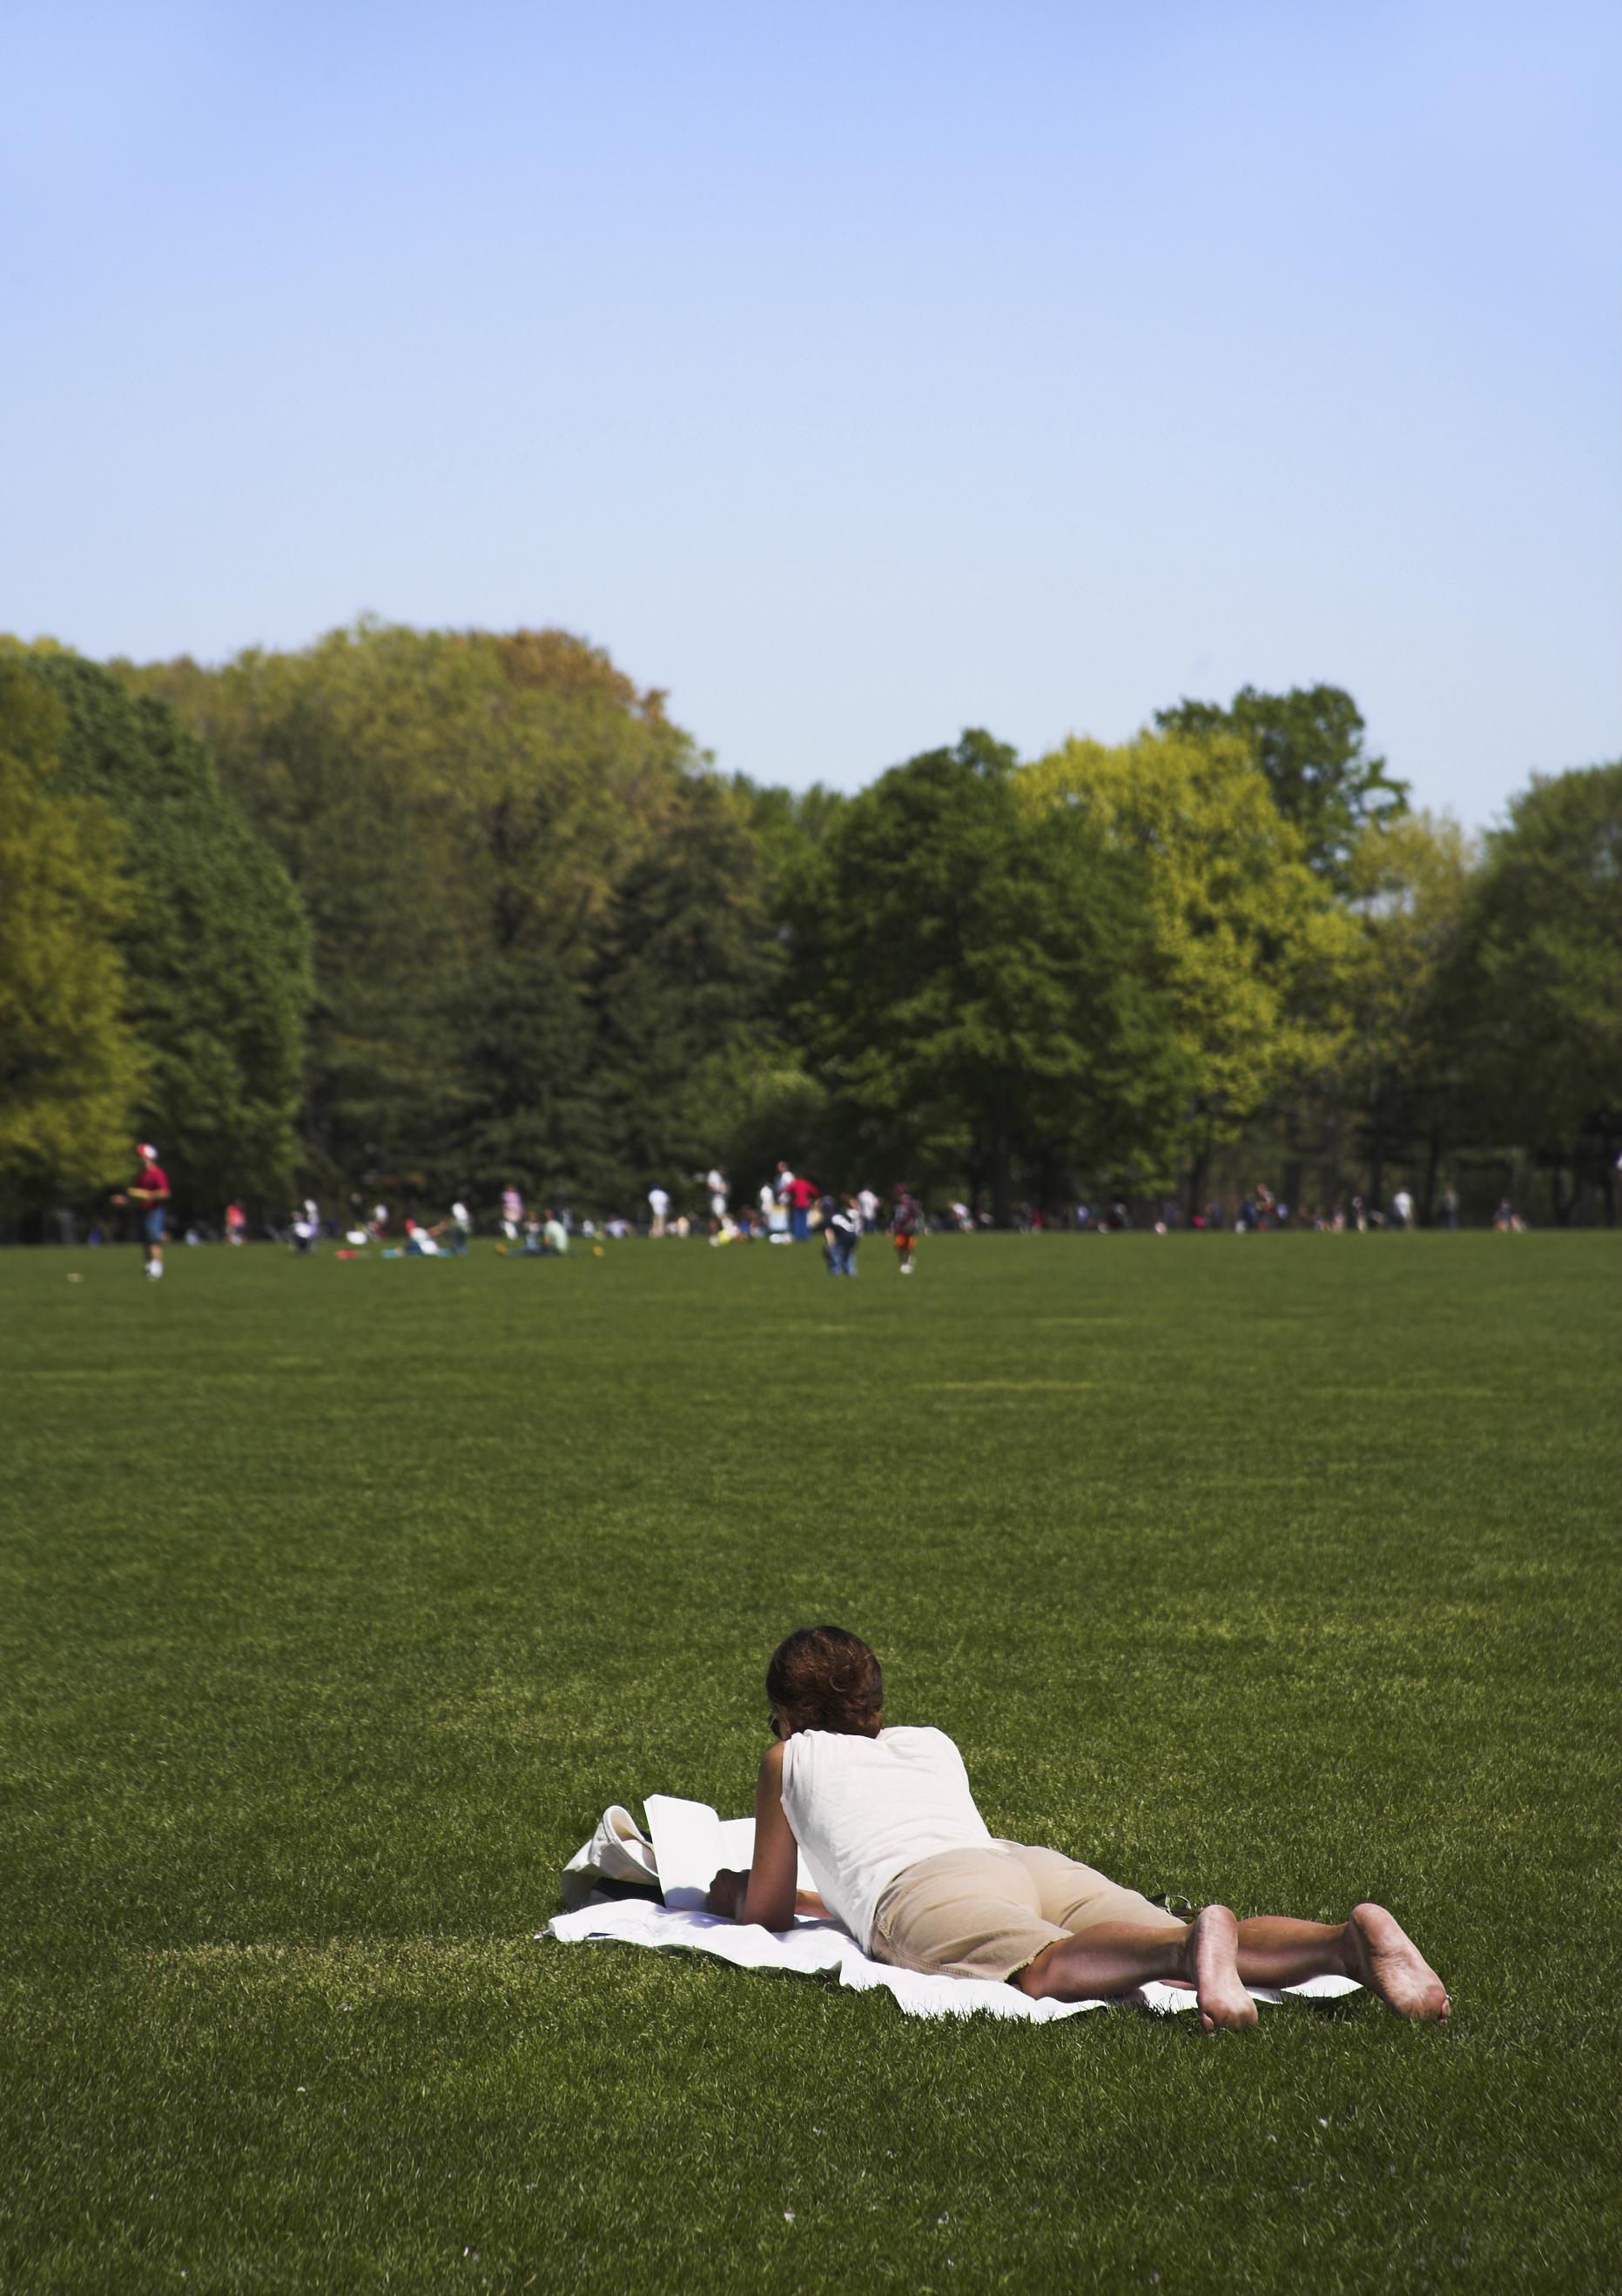 central park in summer